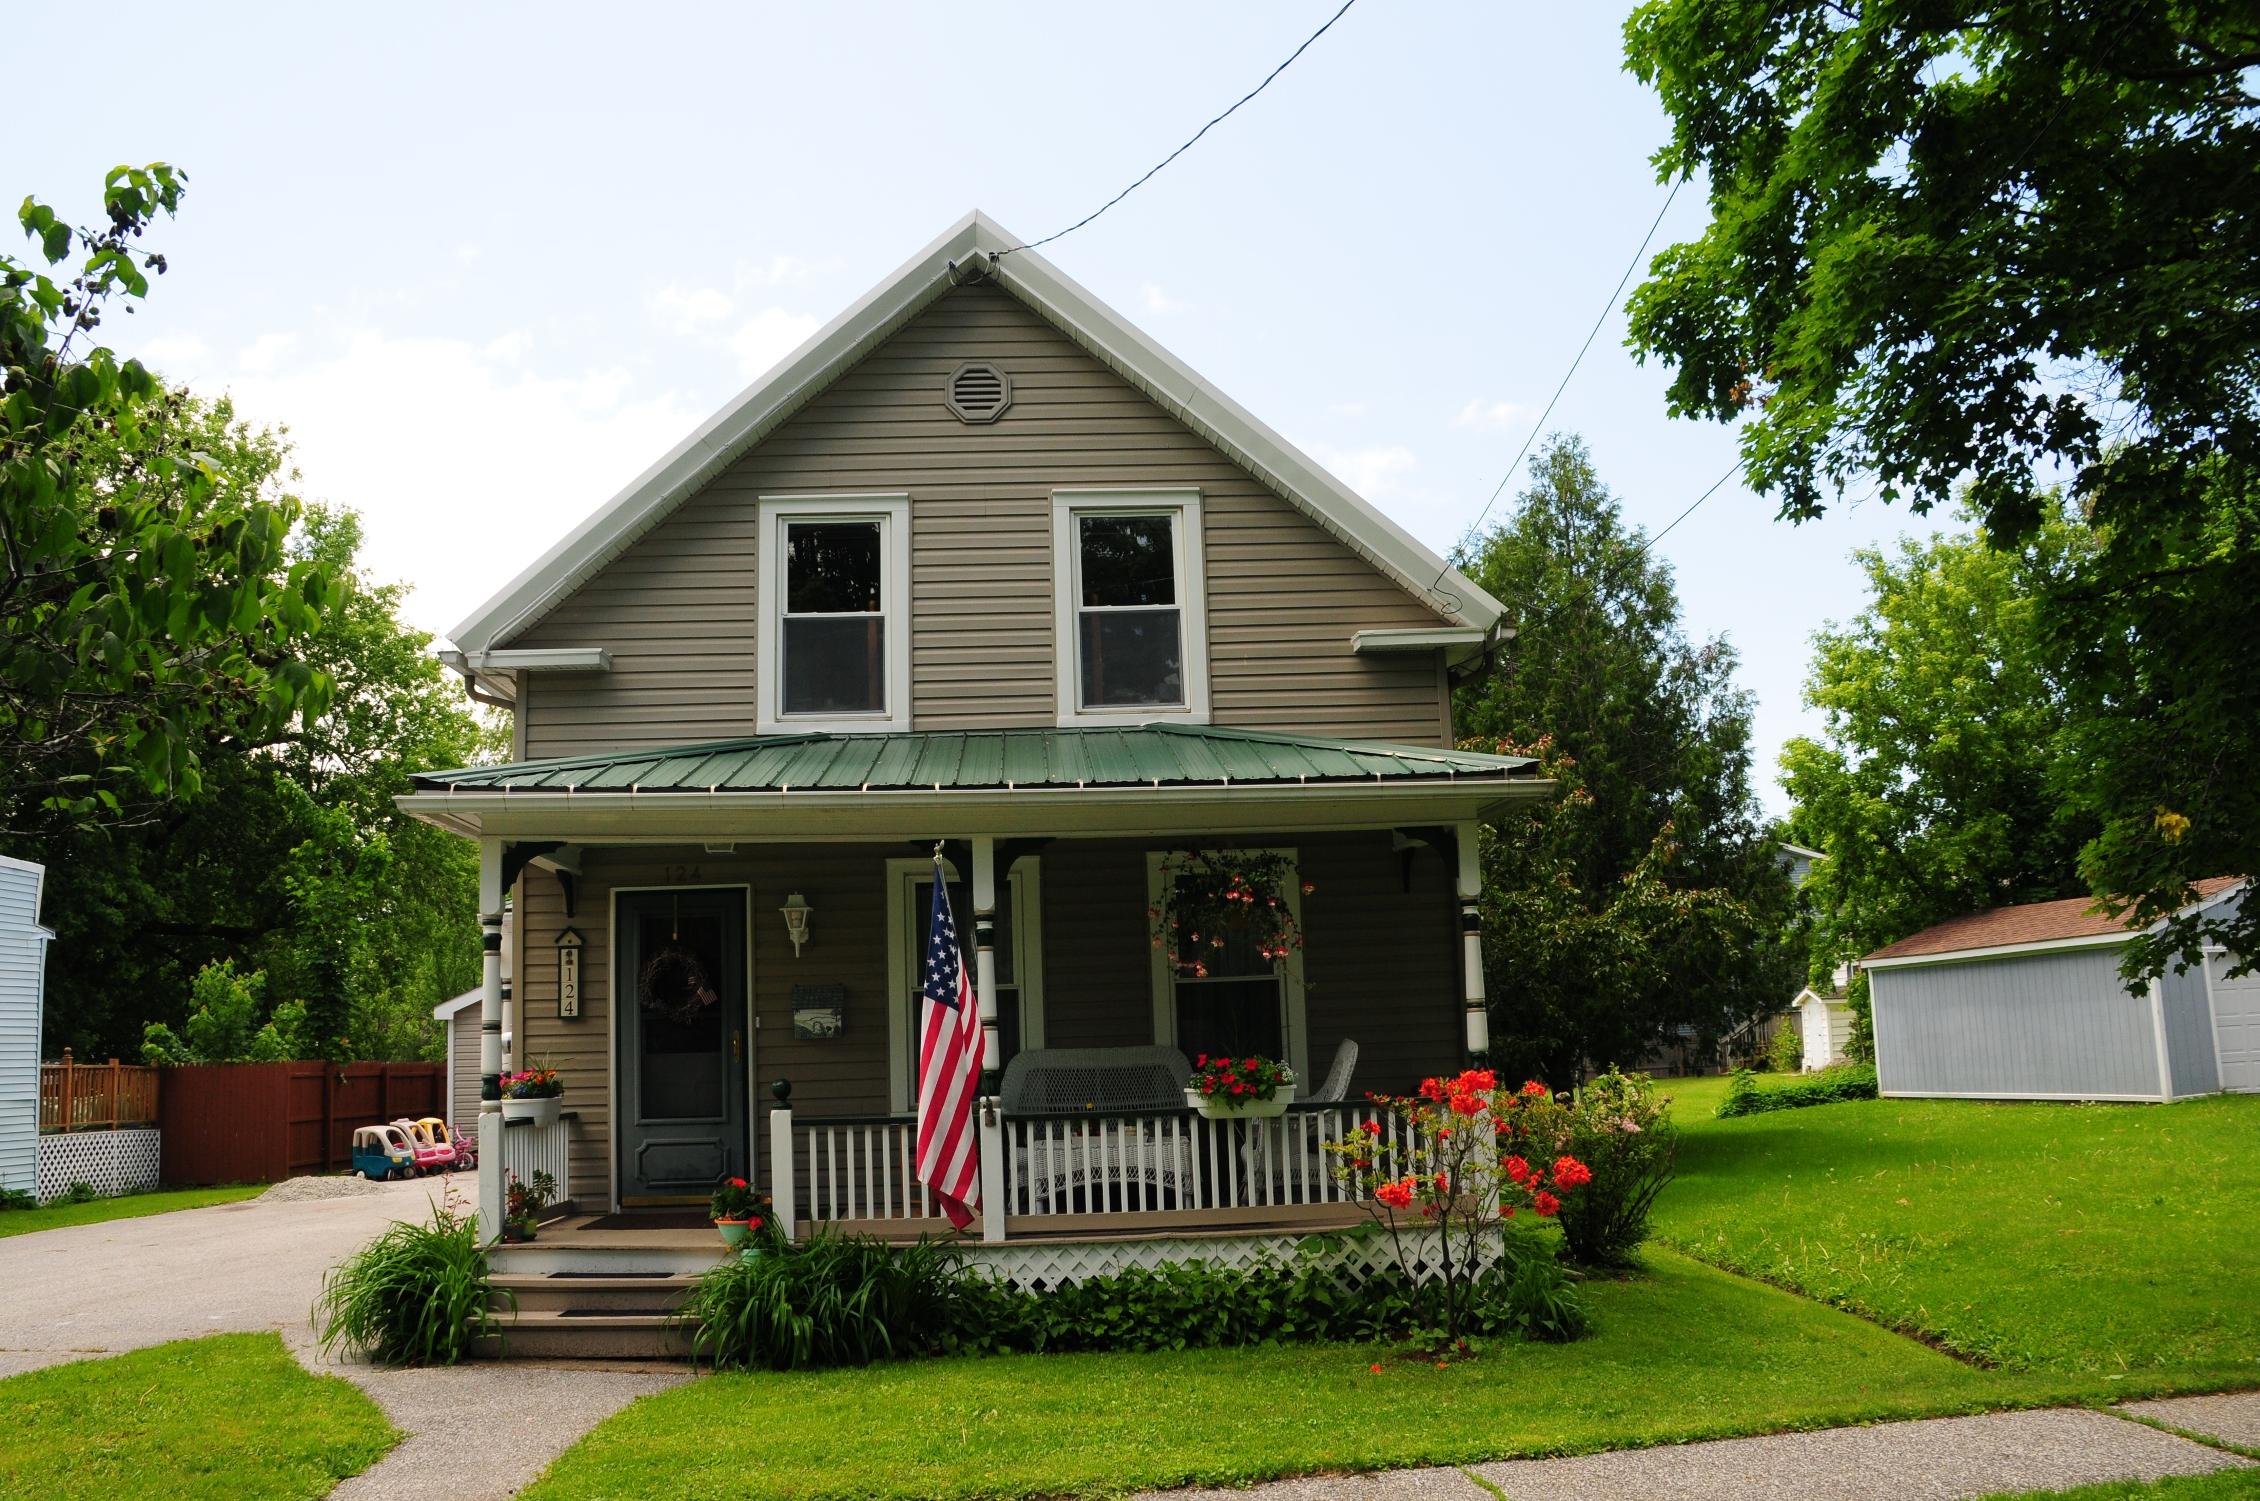 獨棟家庭住宅 為 出售 在 124 Lower Welden St, St. Albans City St. Albans, 佛蒙特州 05478 美國